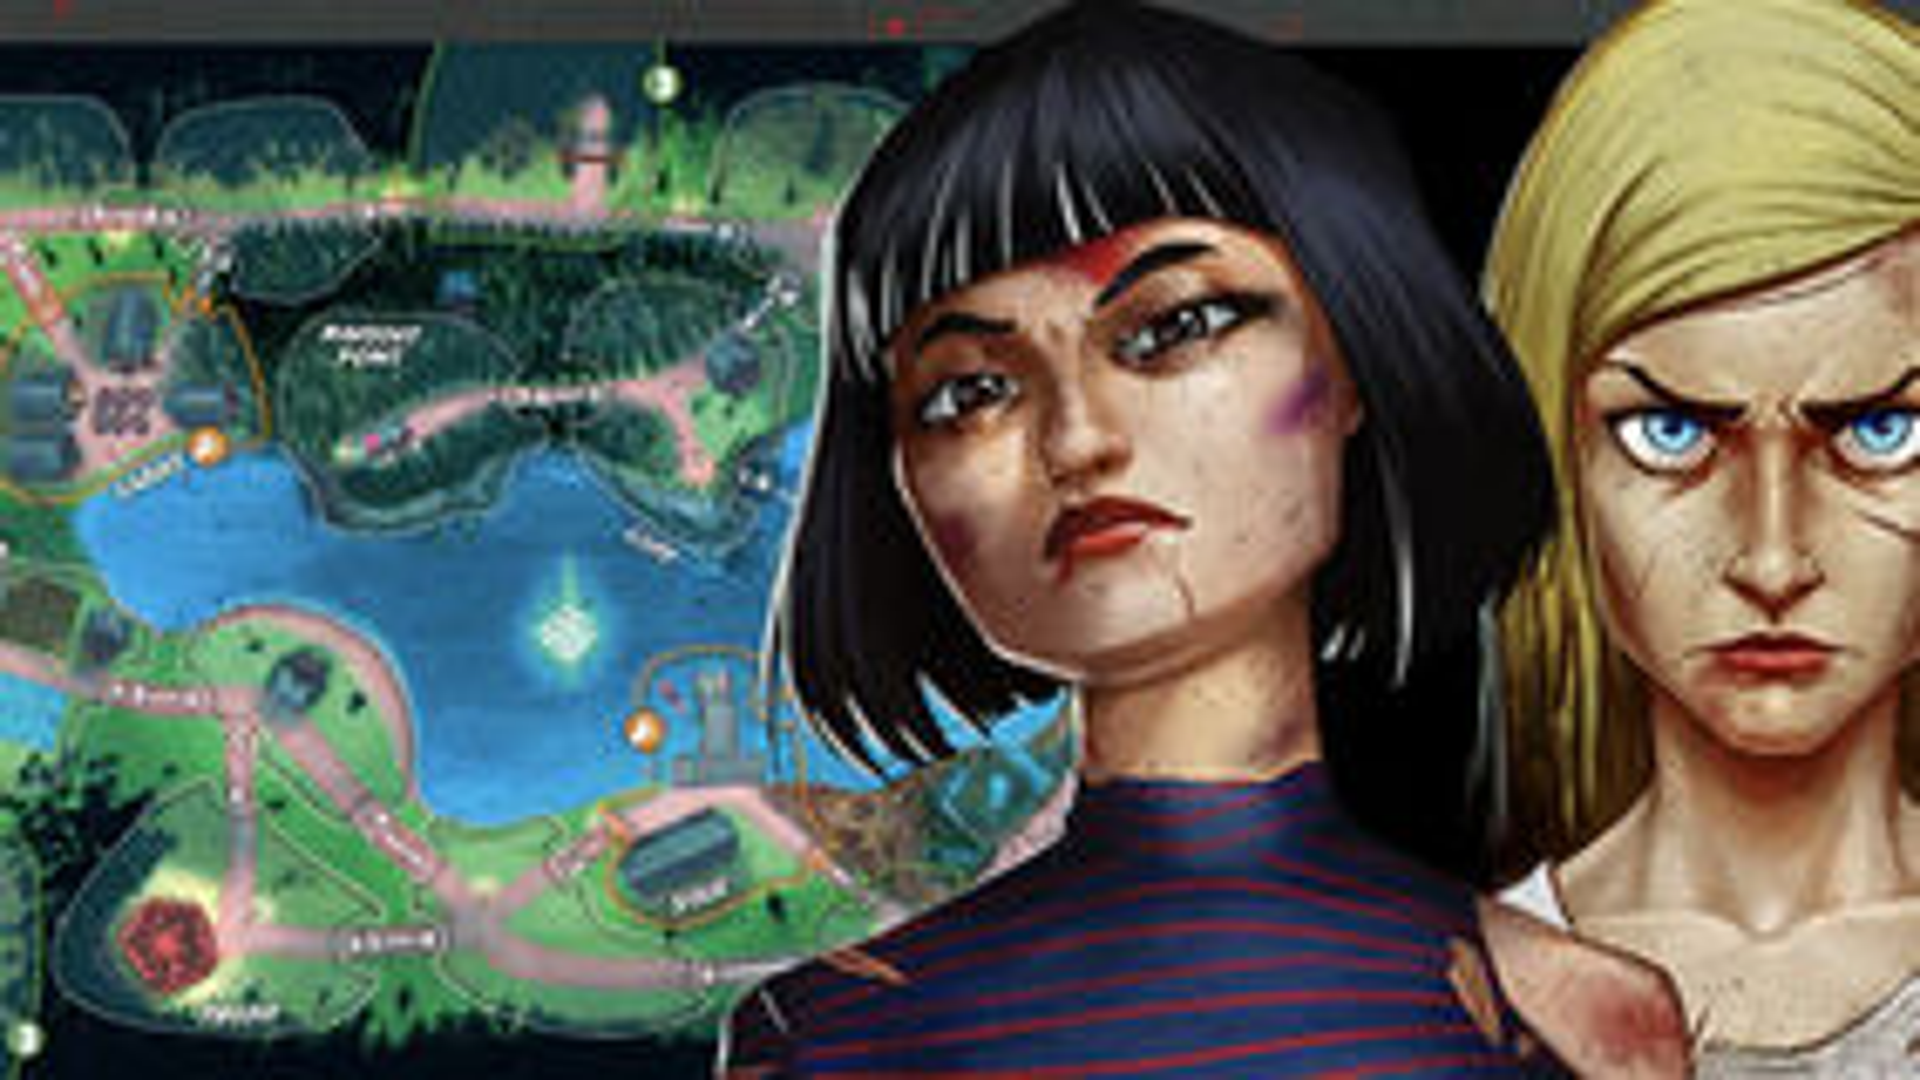 Final Girl board game artwork